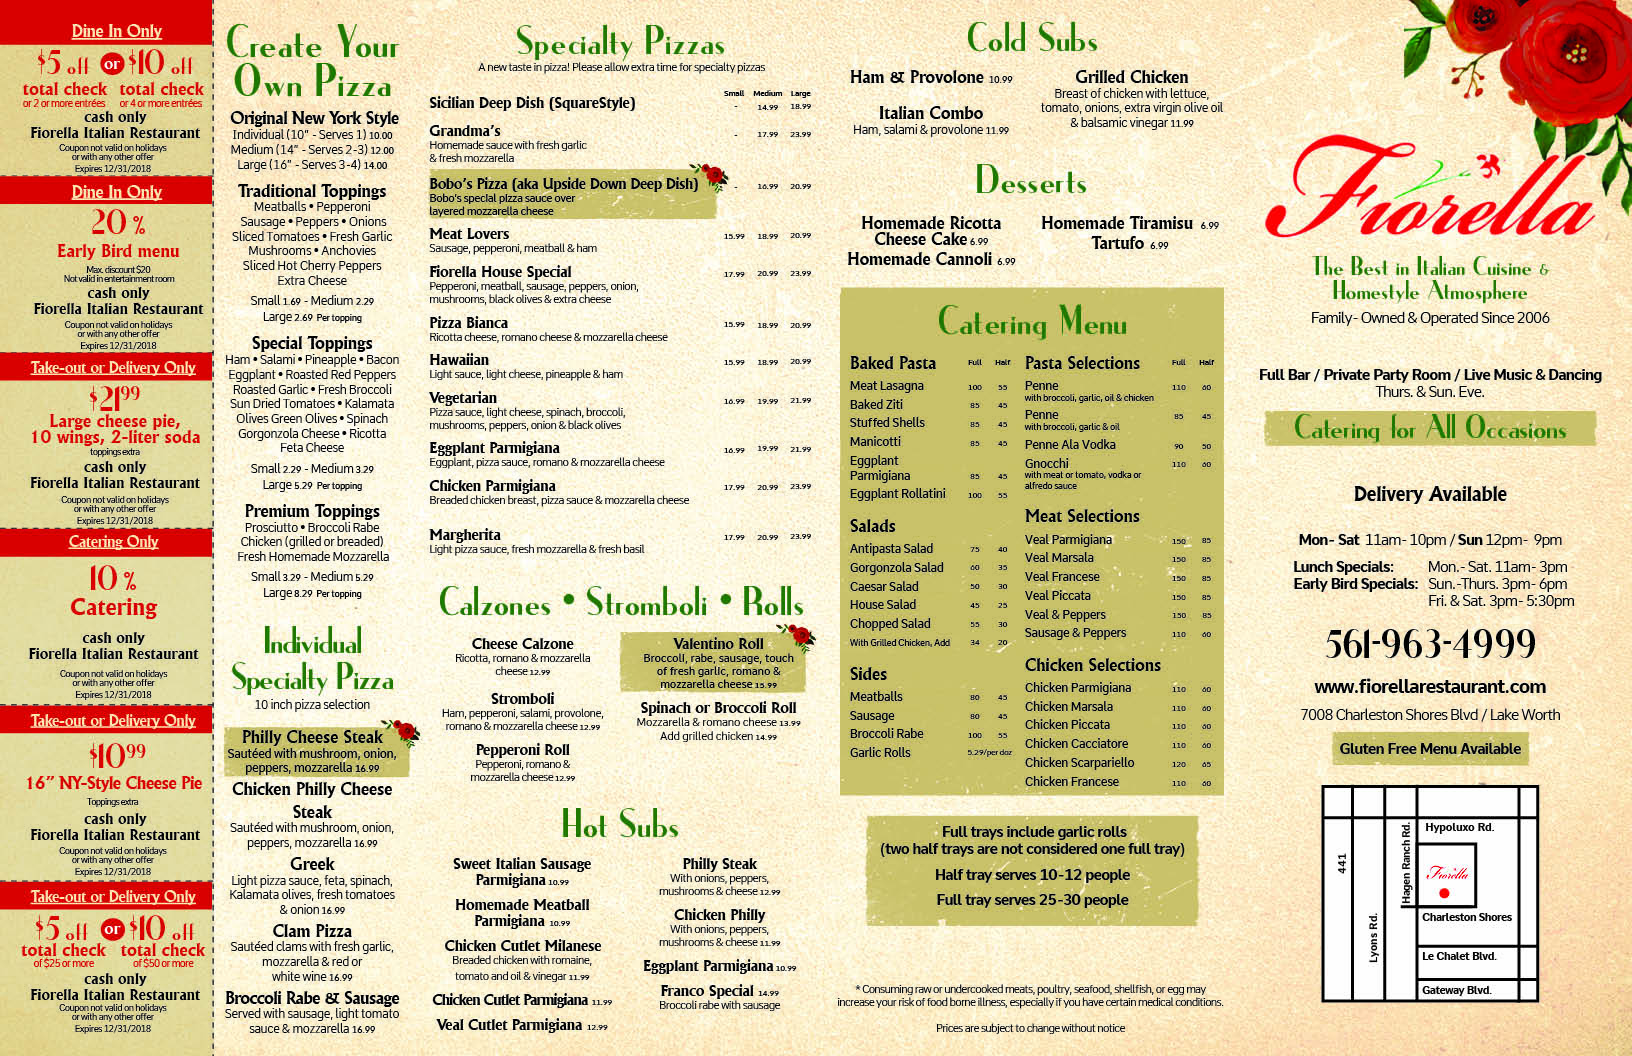 restaurant coupons lake worth florida